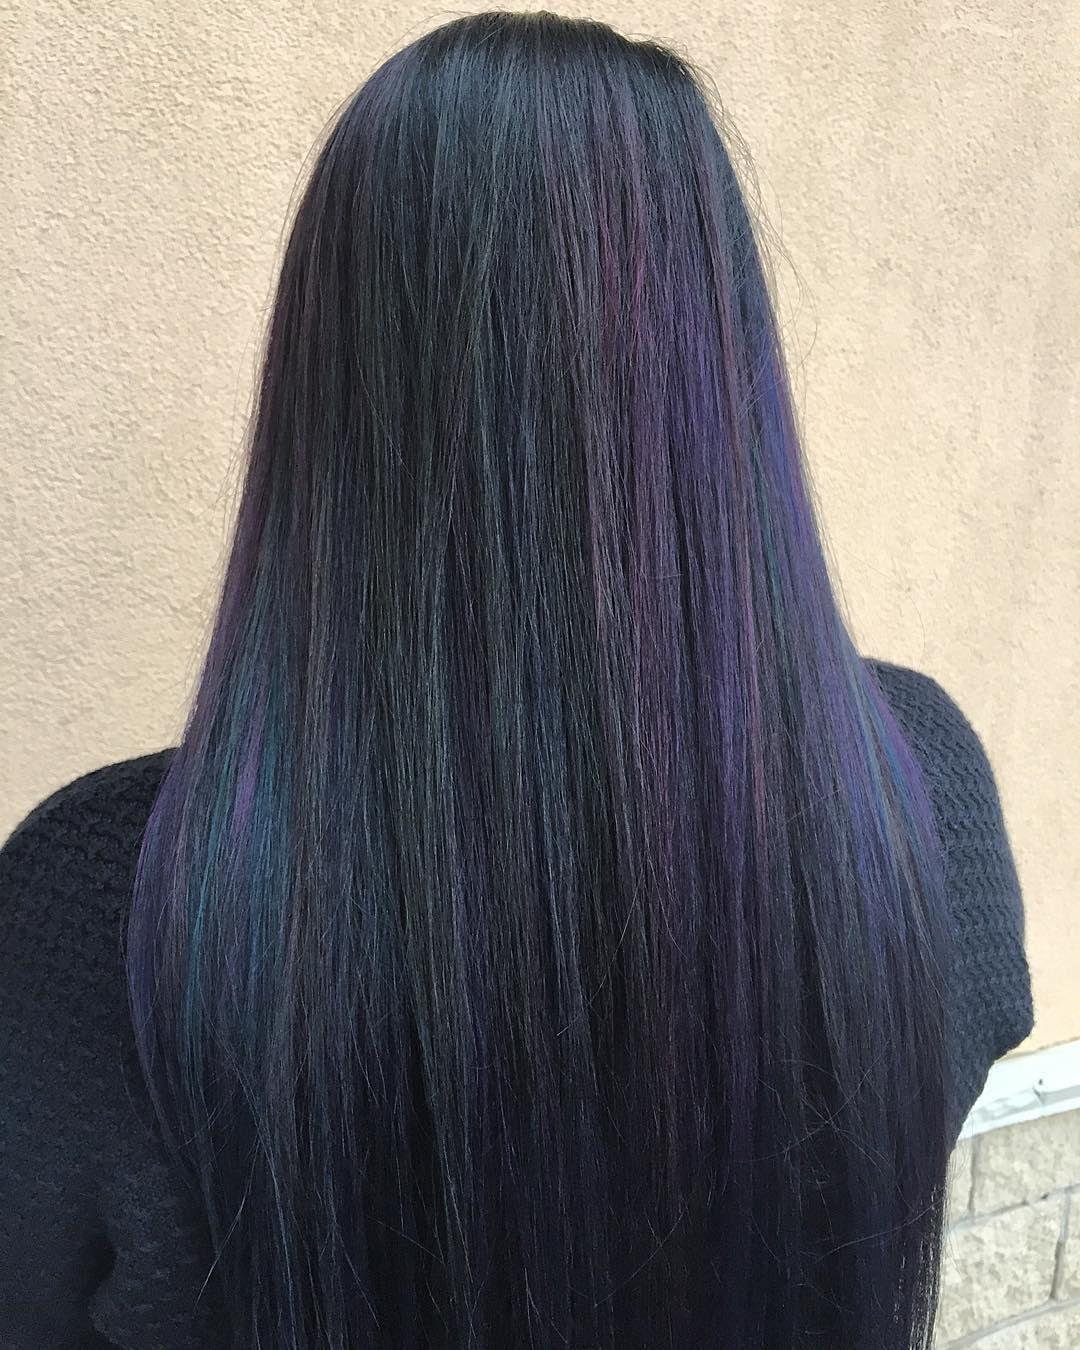 Pin by mayumi dhananjana on hair in pinterest cabello